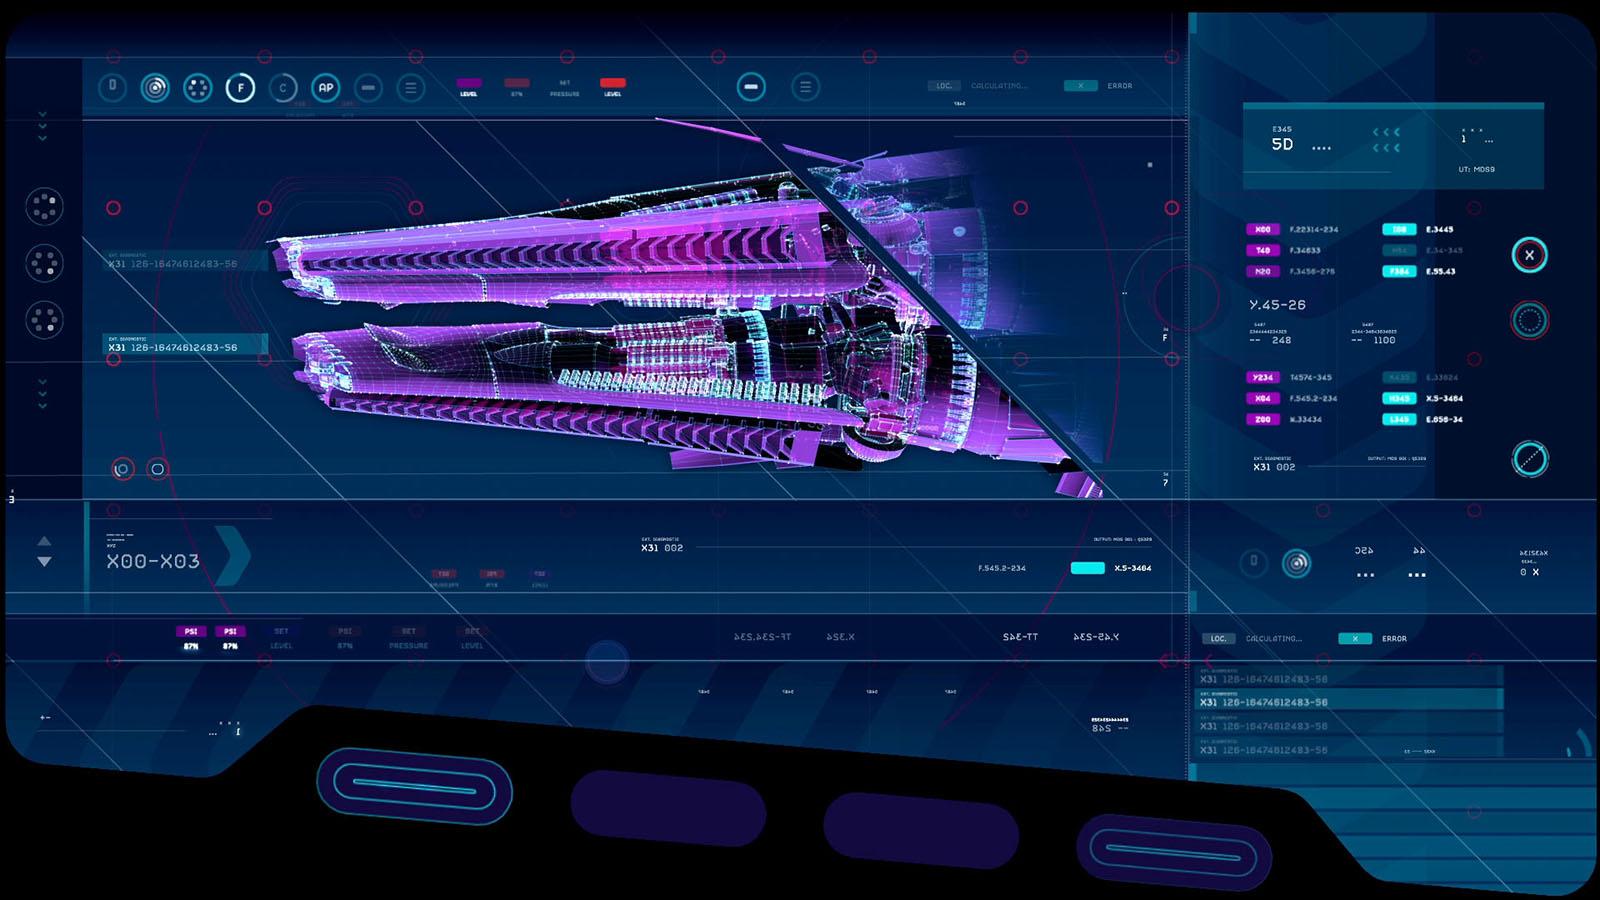 AVIF_Mship_Engineer_0021.jpg